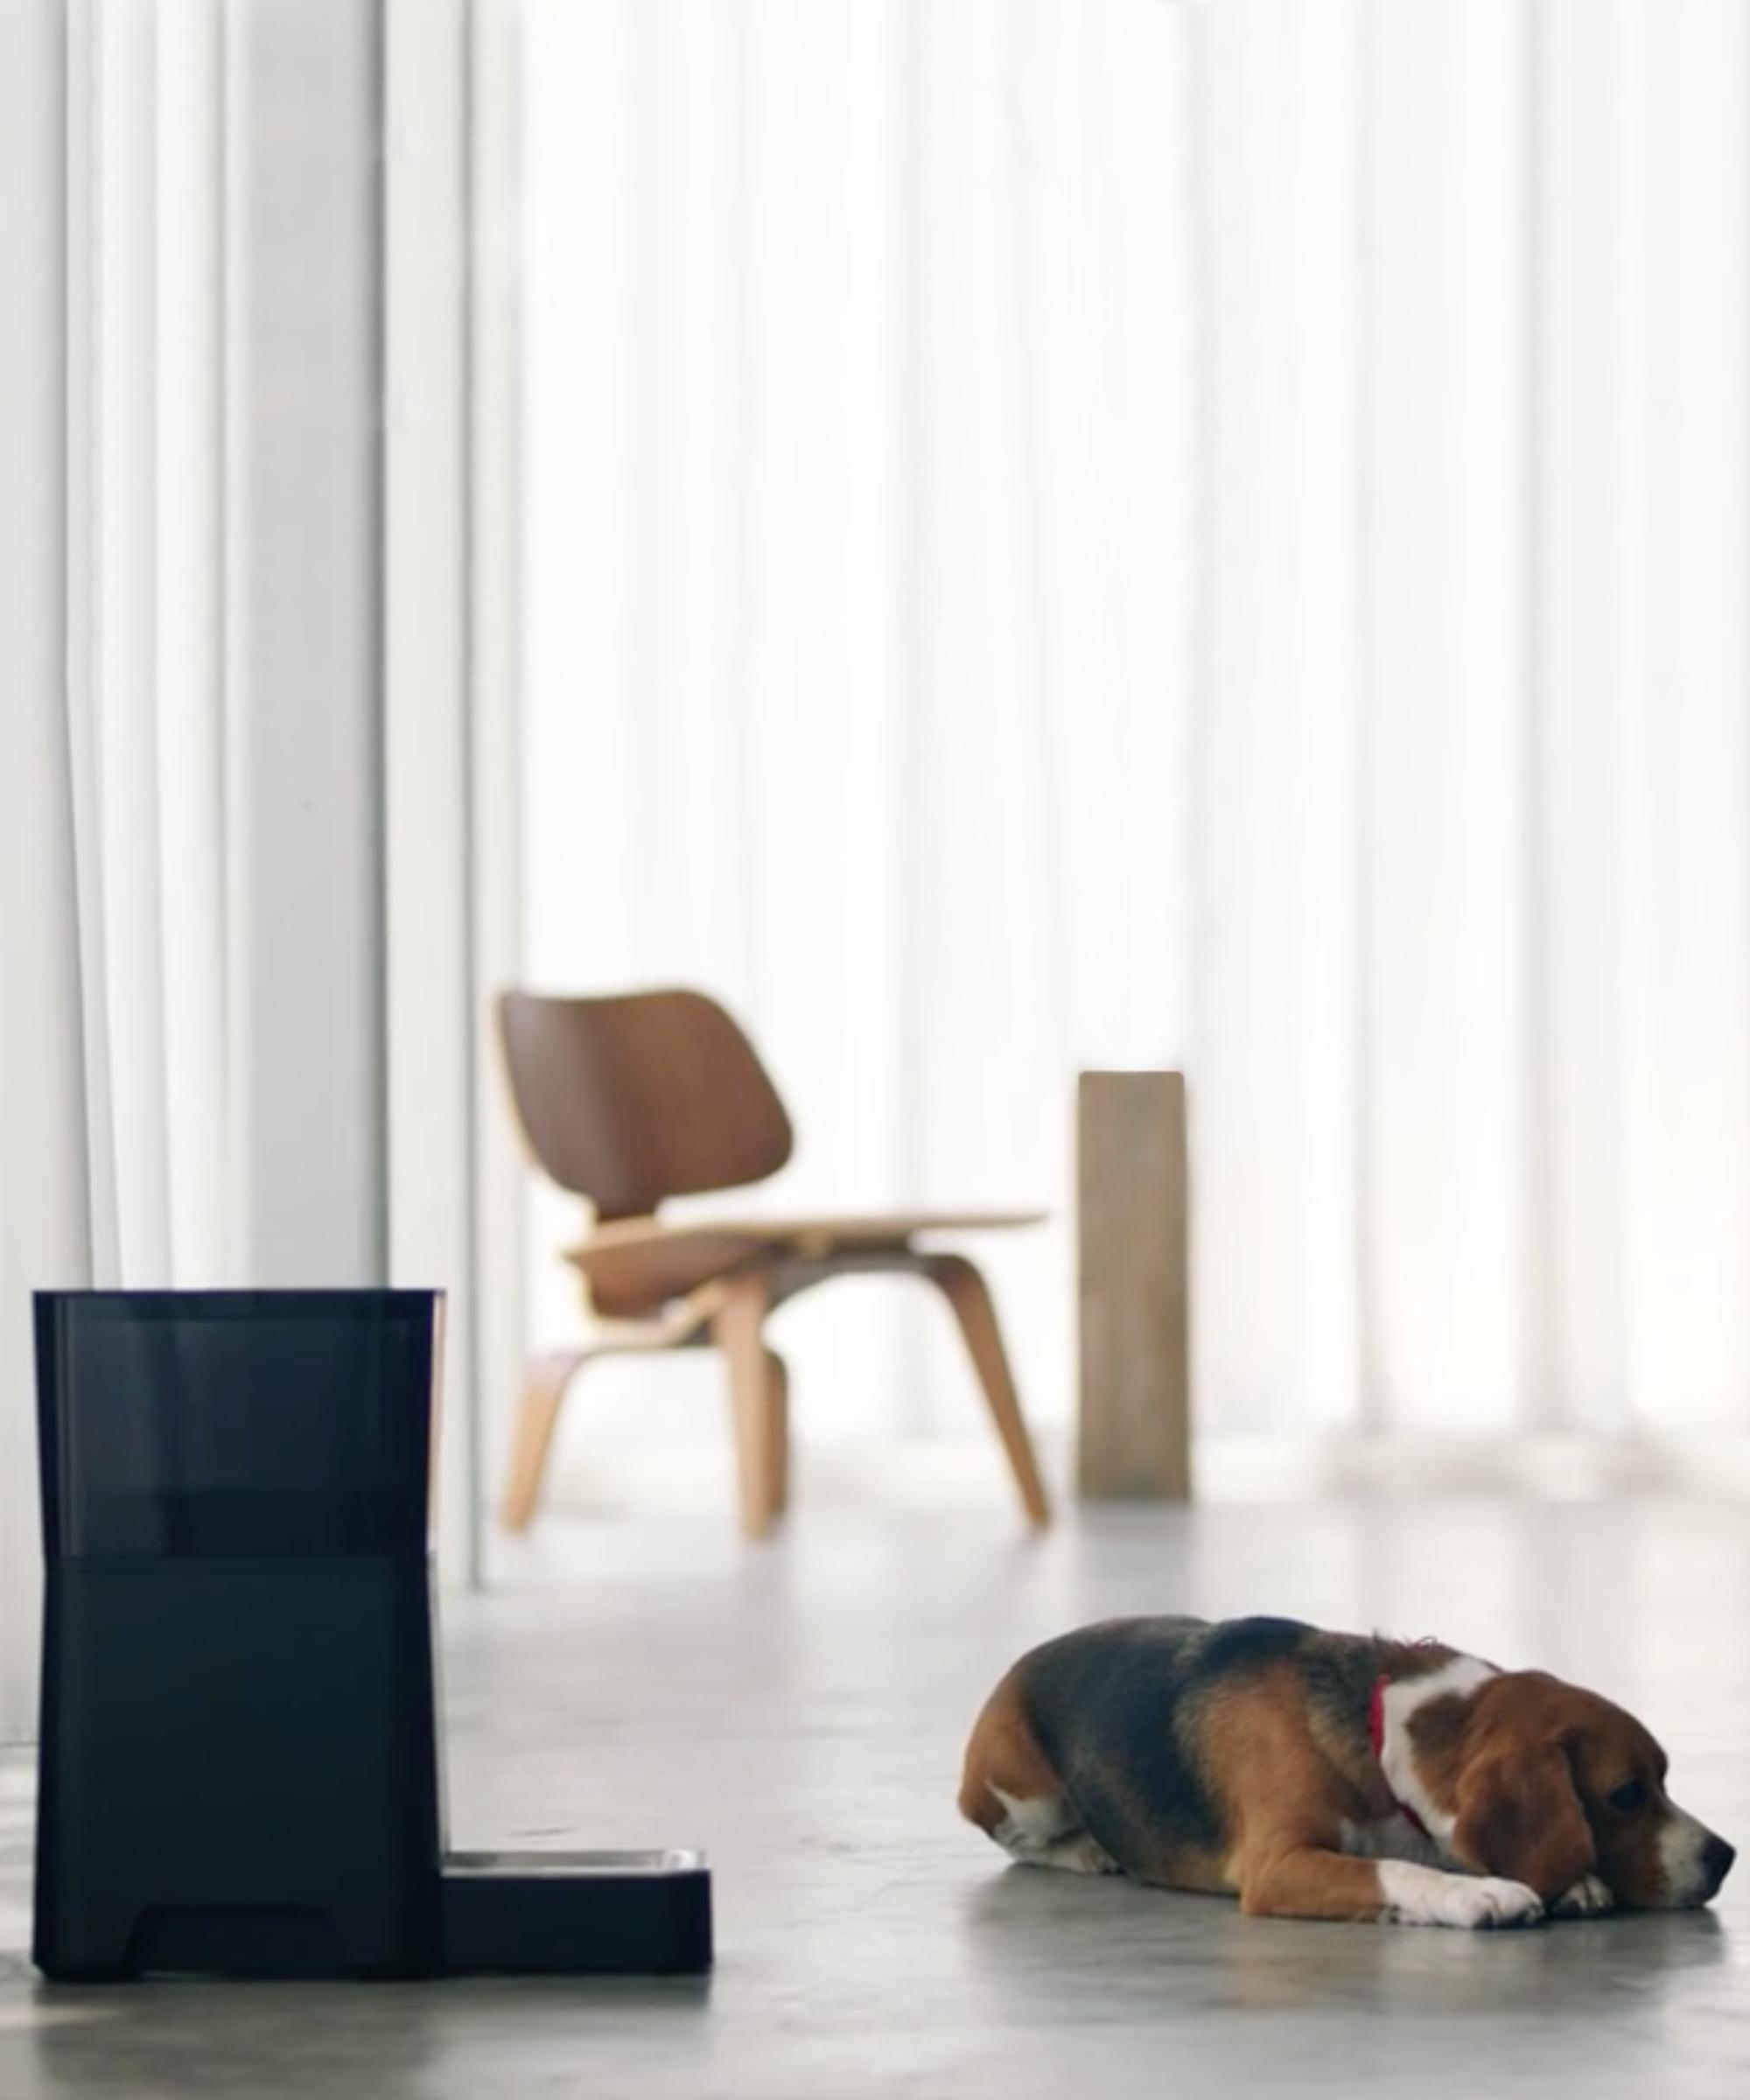 Bronze Ingenious Alte Schöne Bronze Figur Hund Boxer Making Things Convenient For Customers